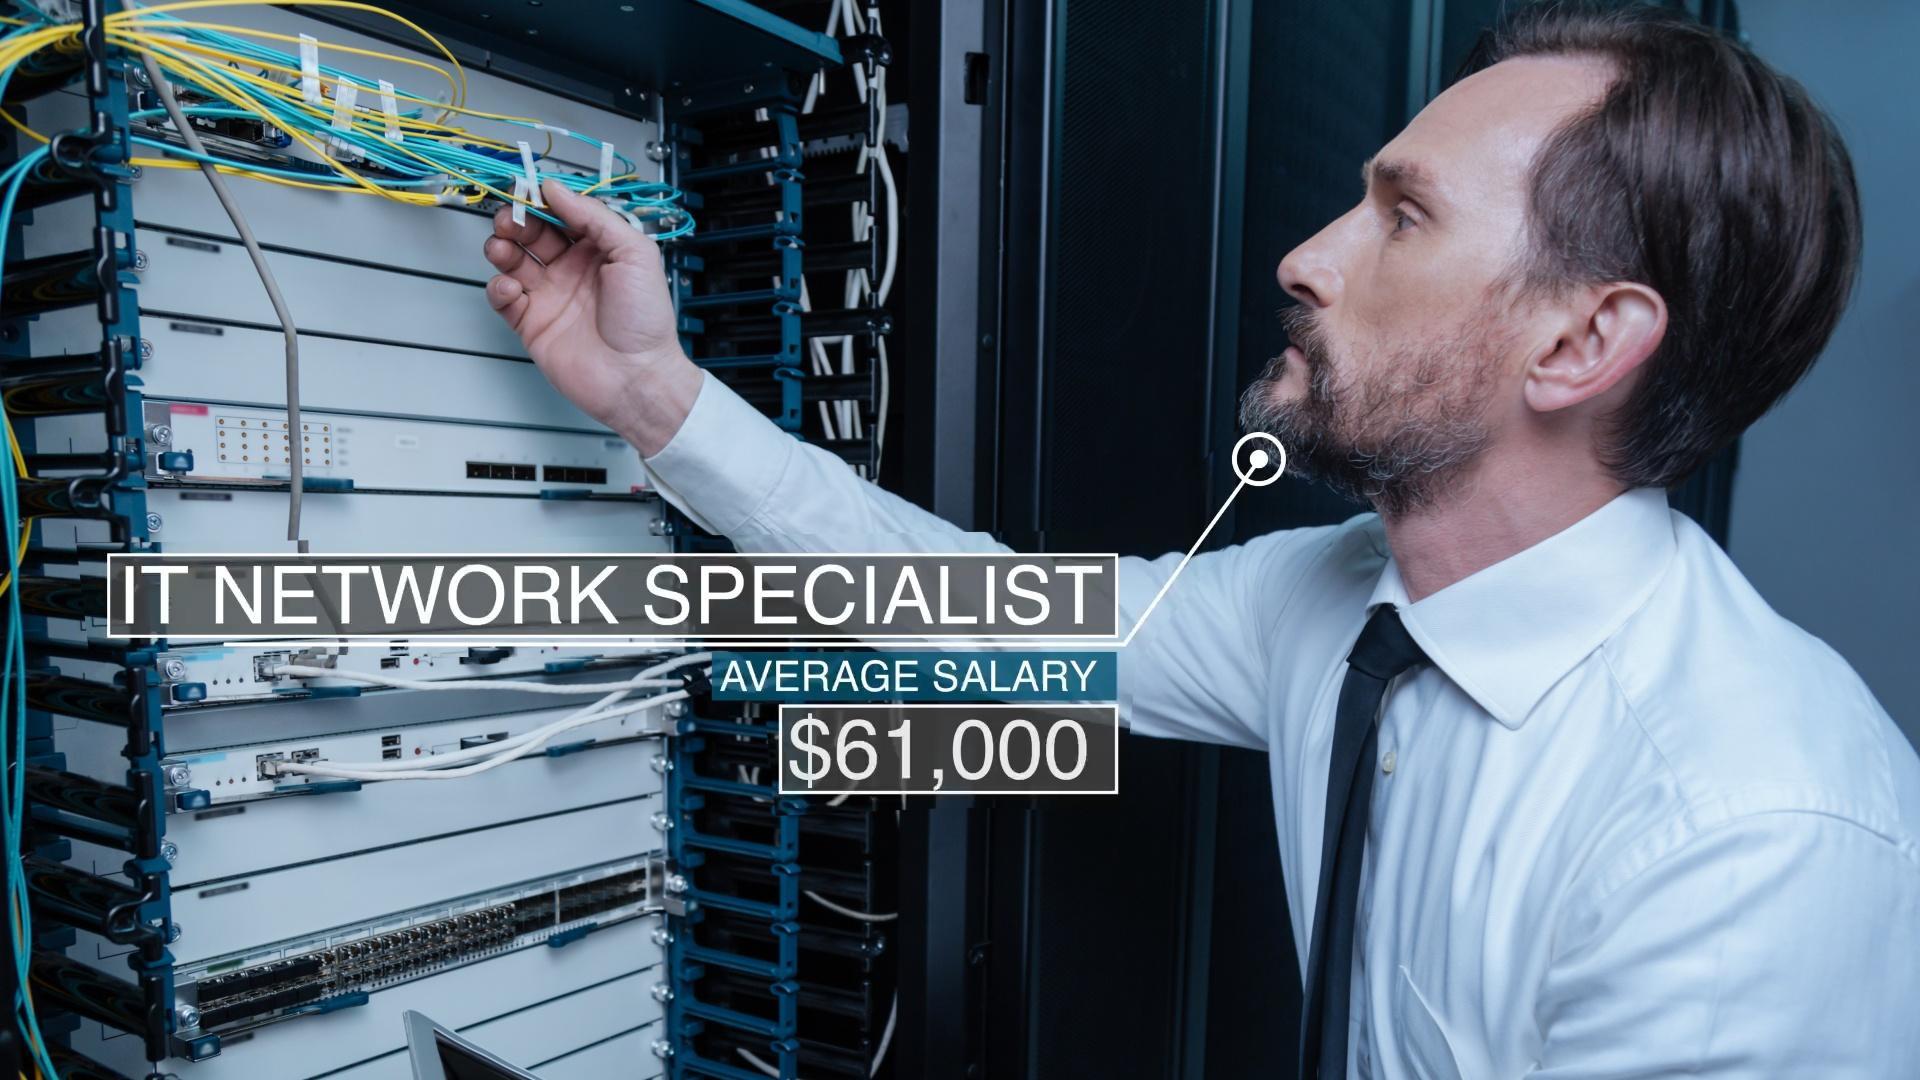 IT Network Specialist